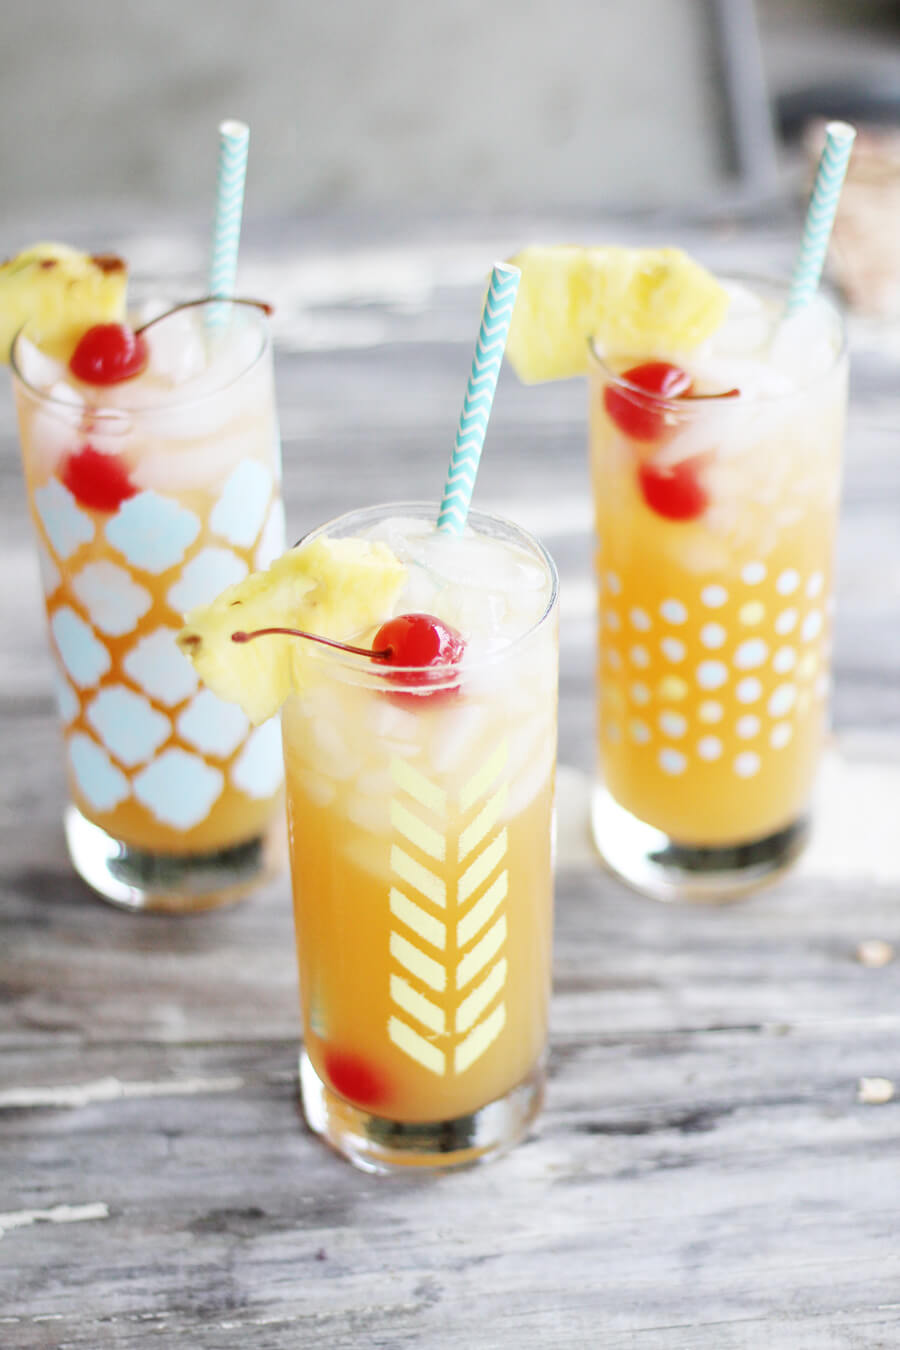 Tropical Lemonade Mocktail + Stenciled Glass DIY